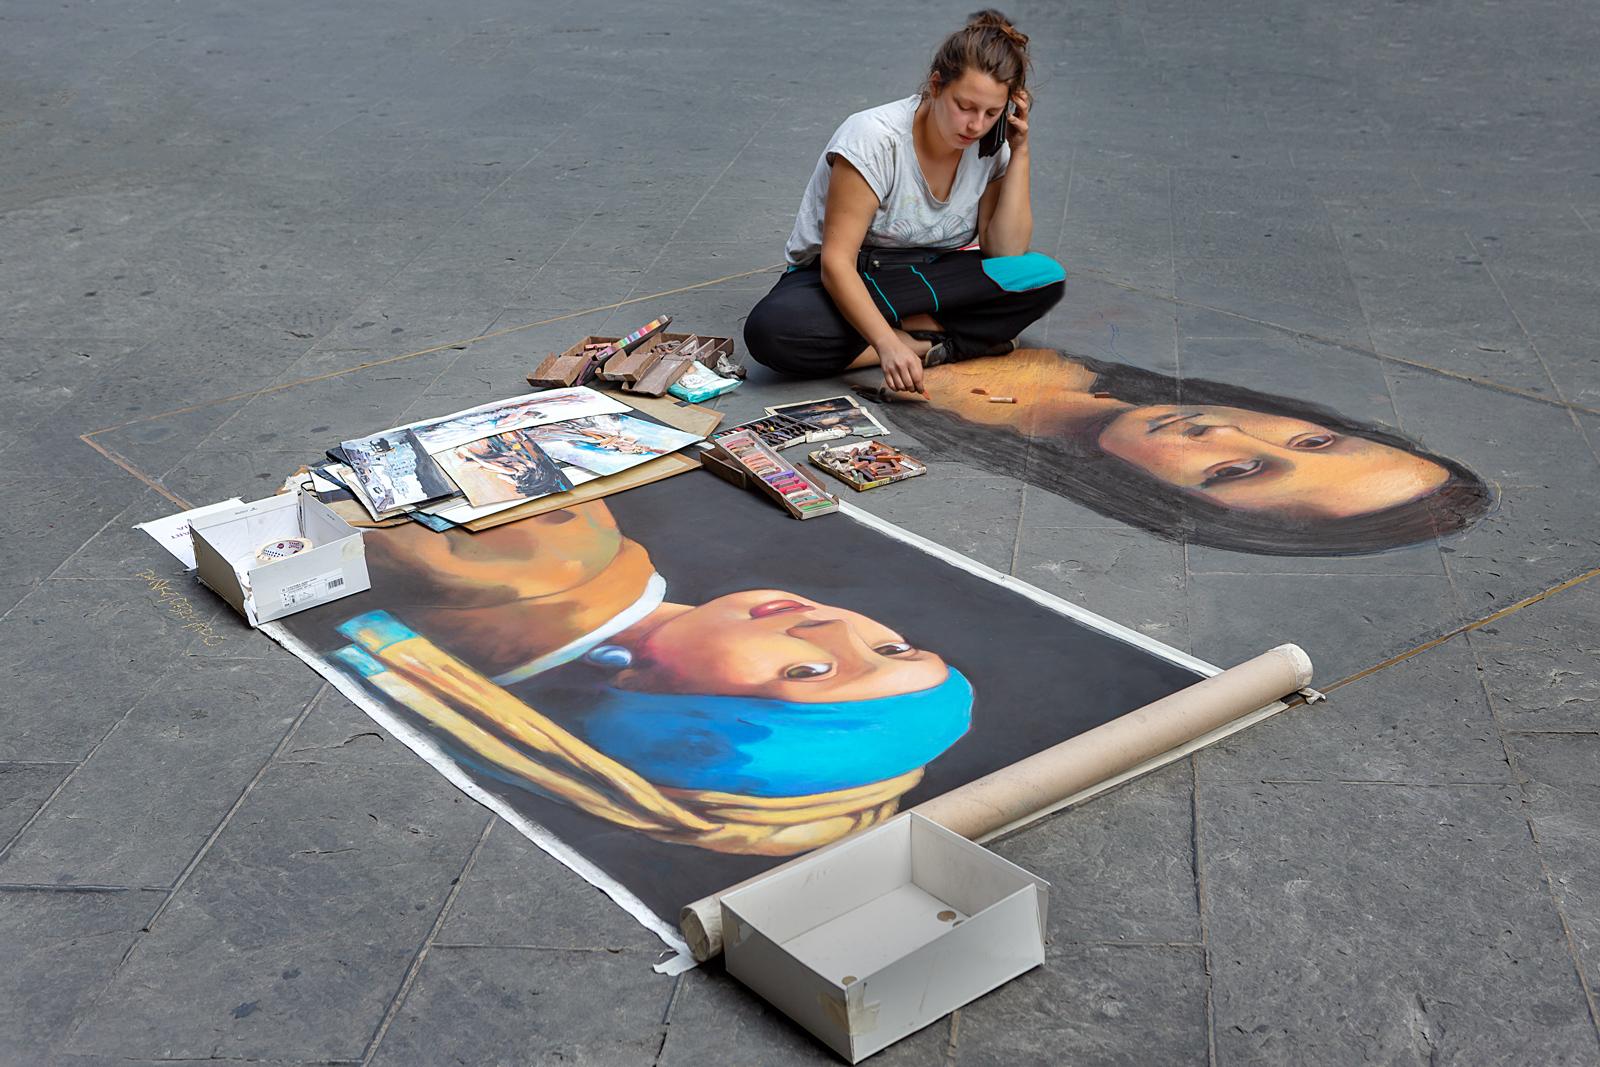 Peter-Rocchiccioli-Serious-Street-Artist-Florence-9